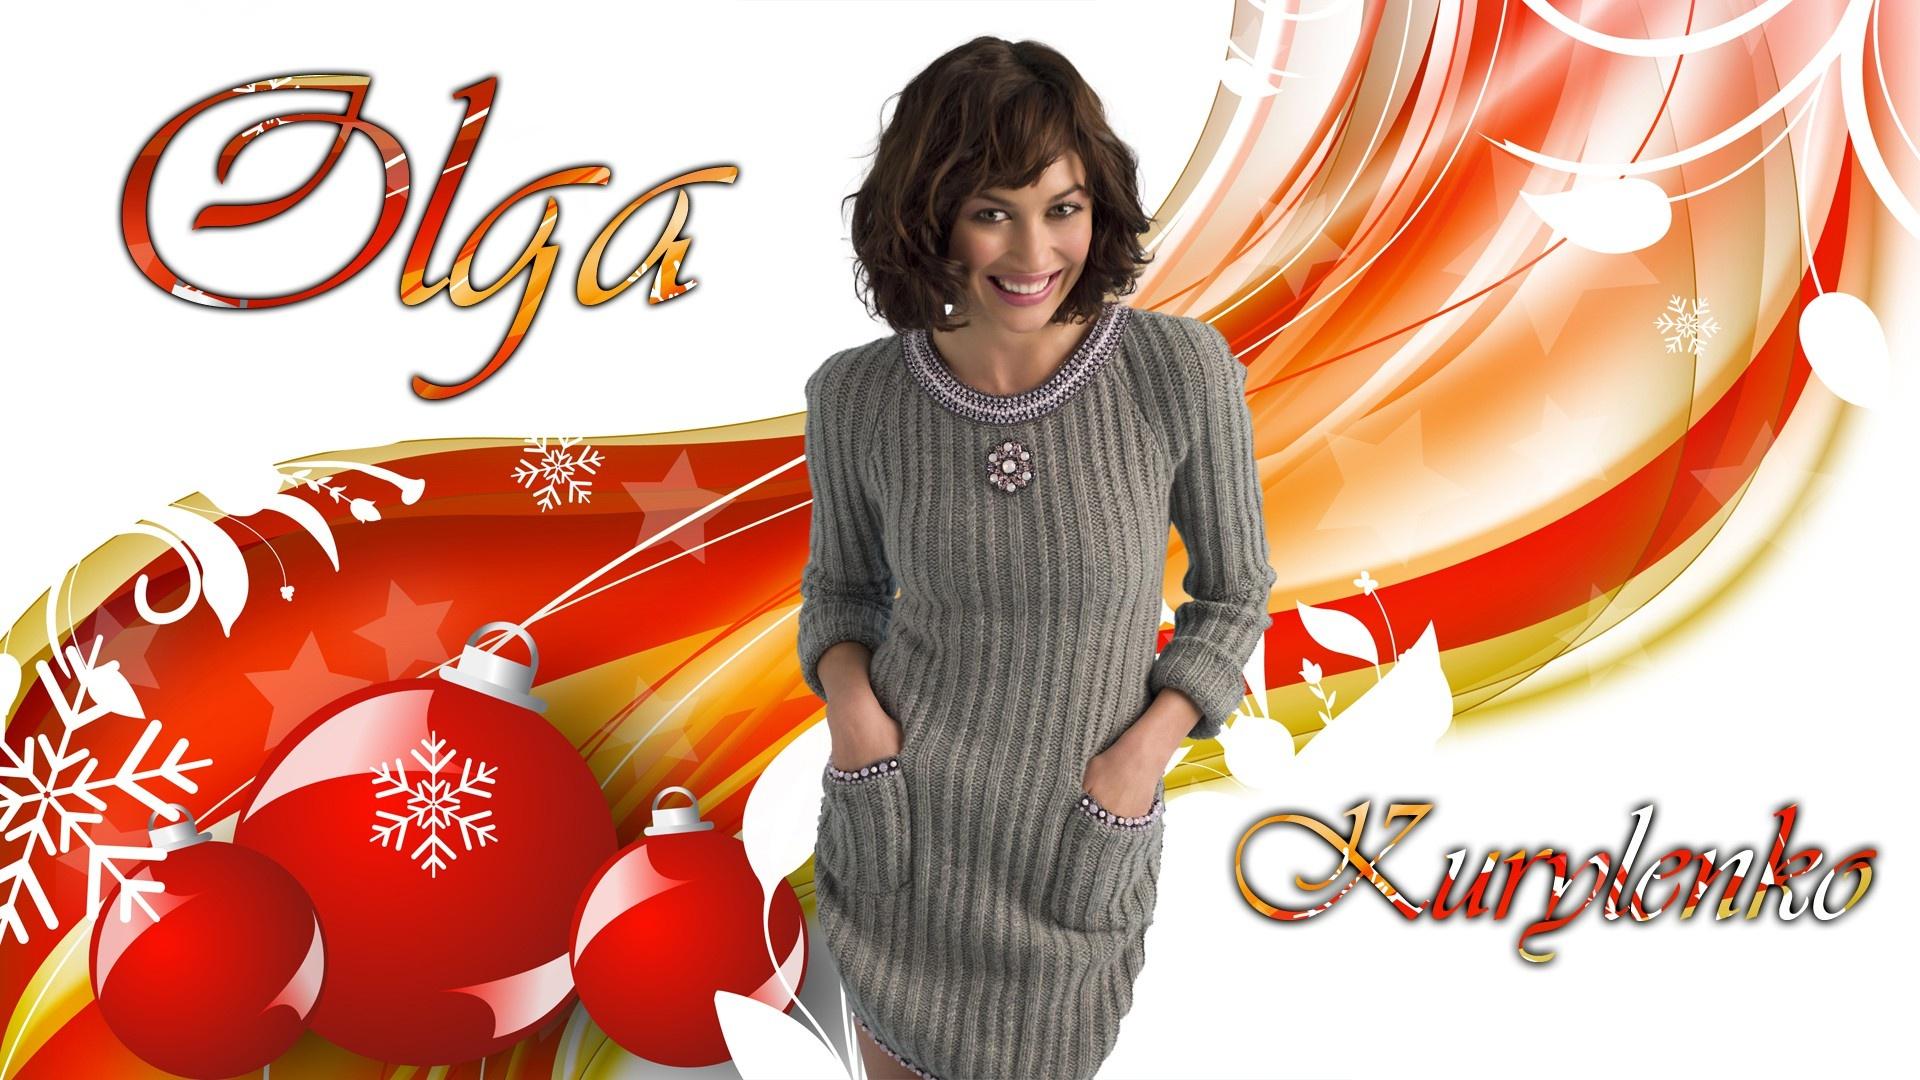 Olga kurylenko  christmas       393838 HD Wallpaper